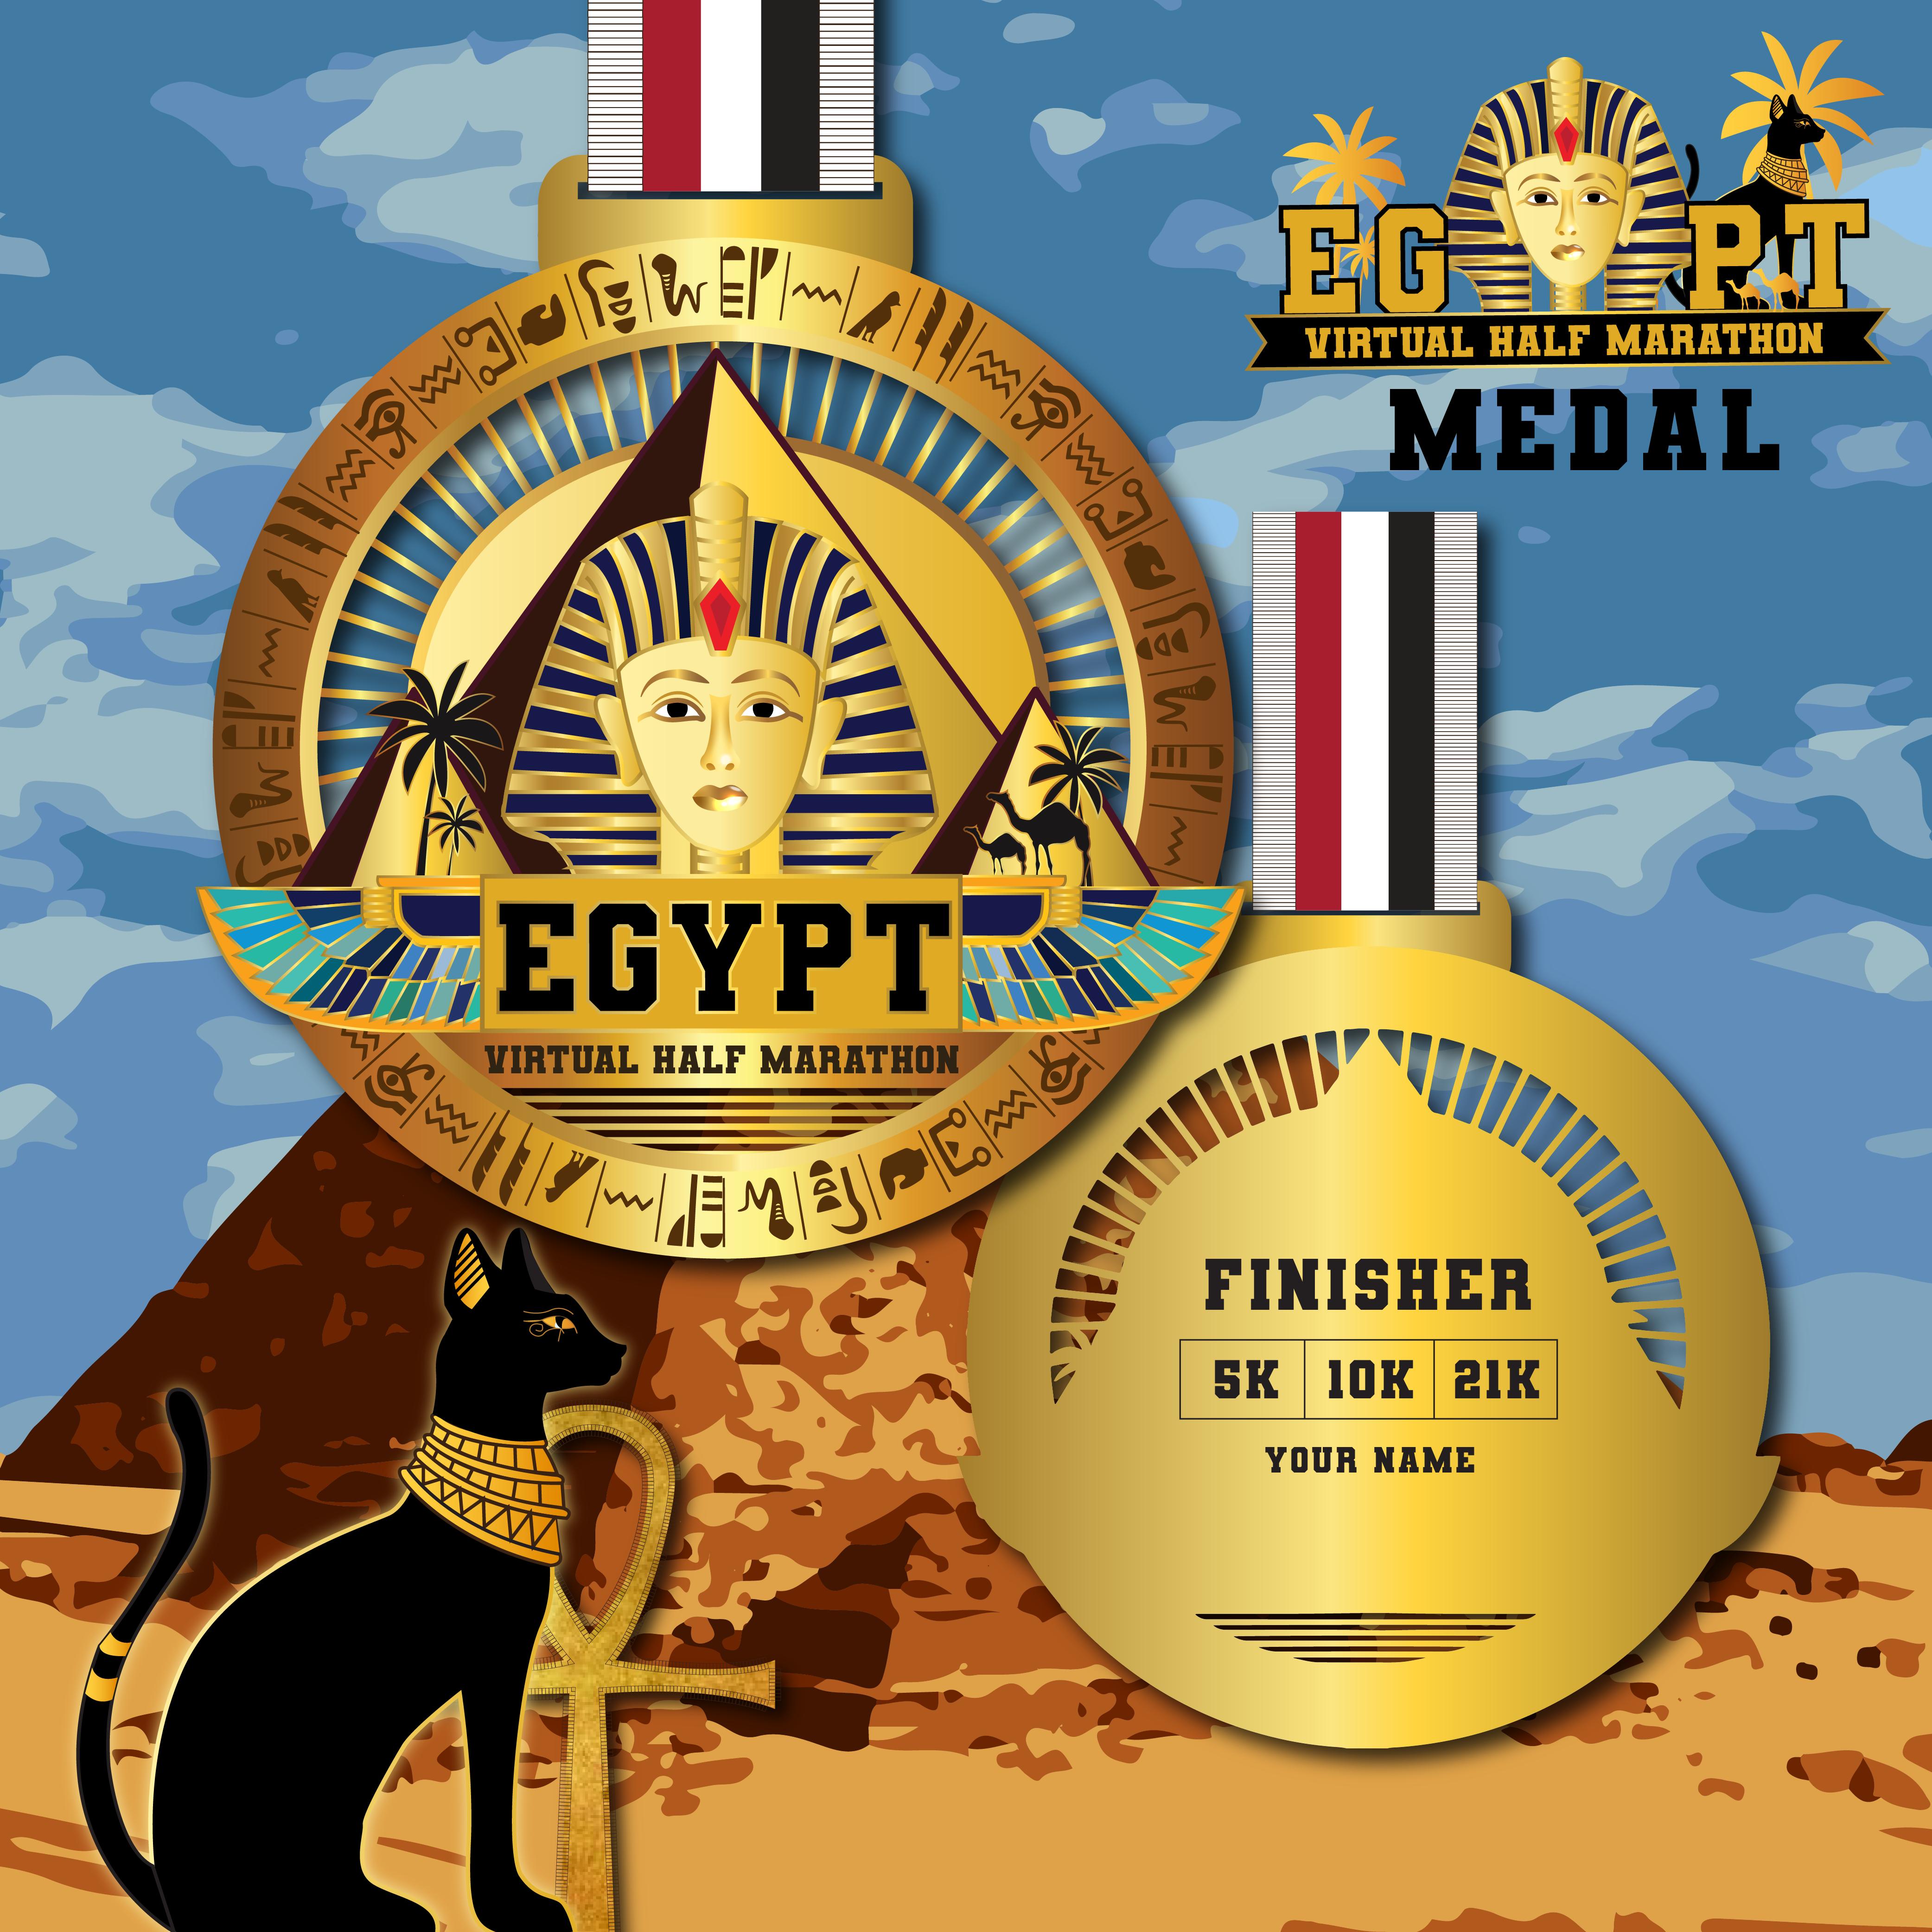 Egypt Virtual Half Marathon